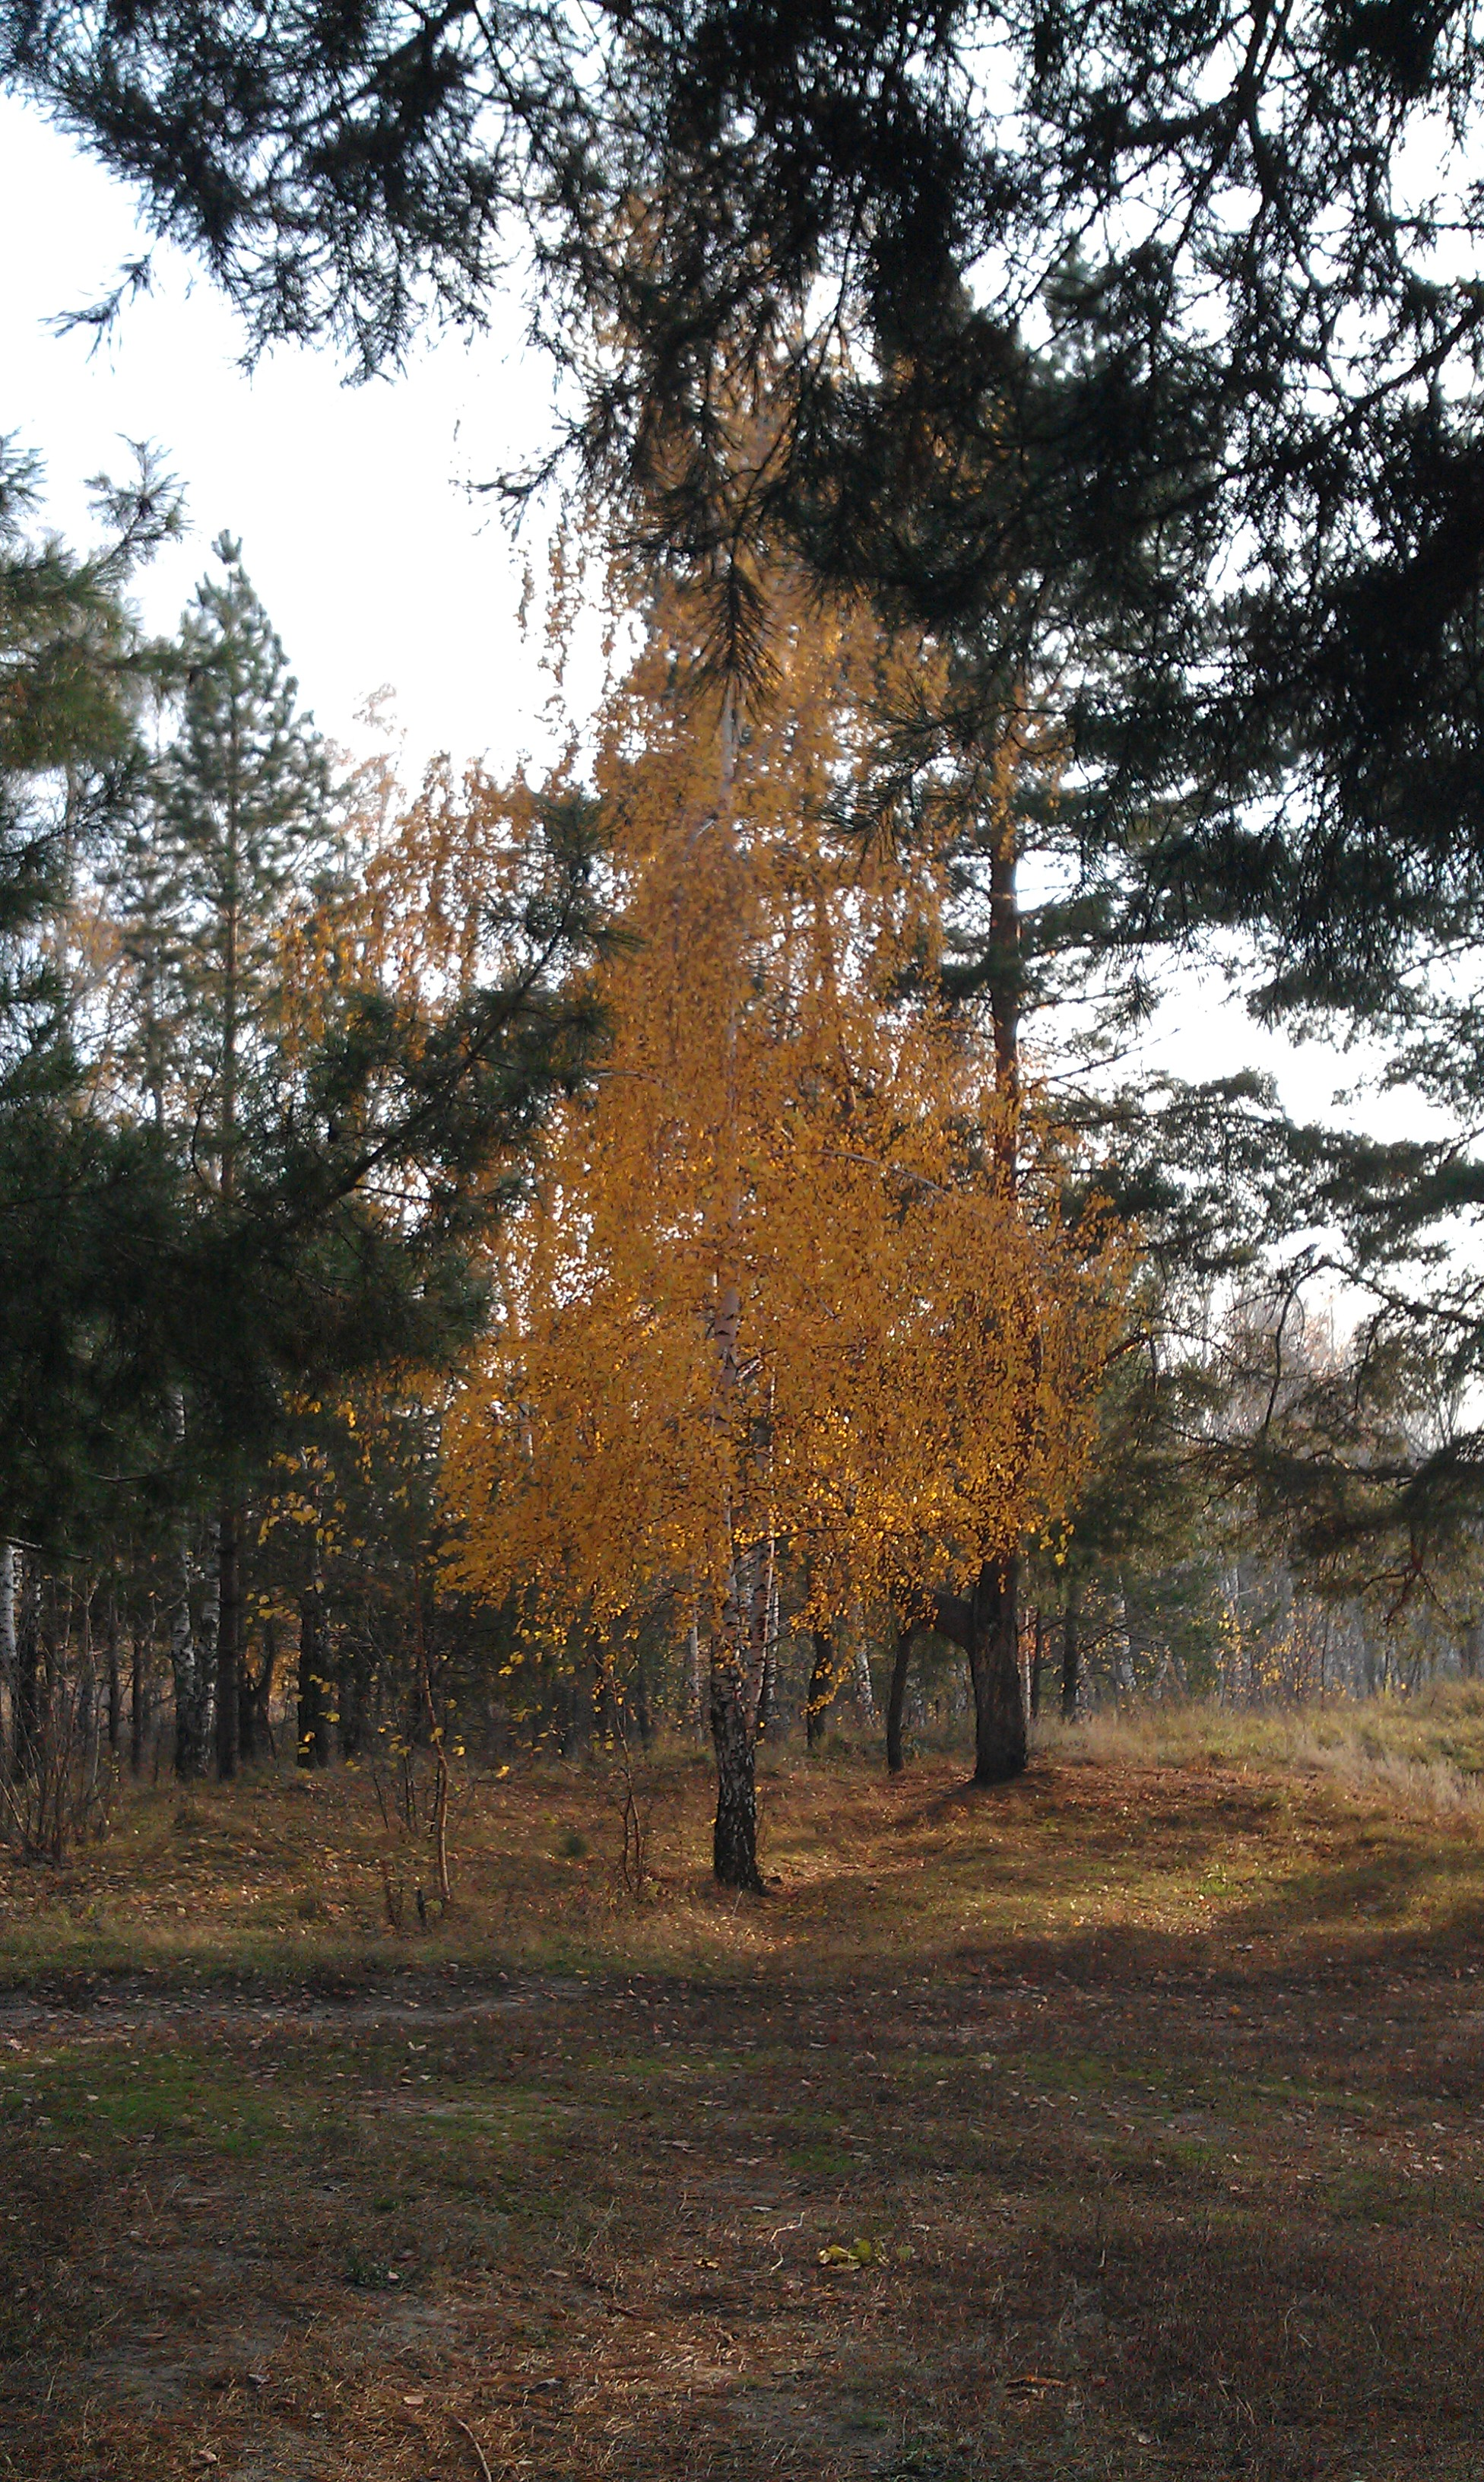 Ловля окуня осенью, осенний лес у водоёма, подробное фото